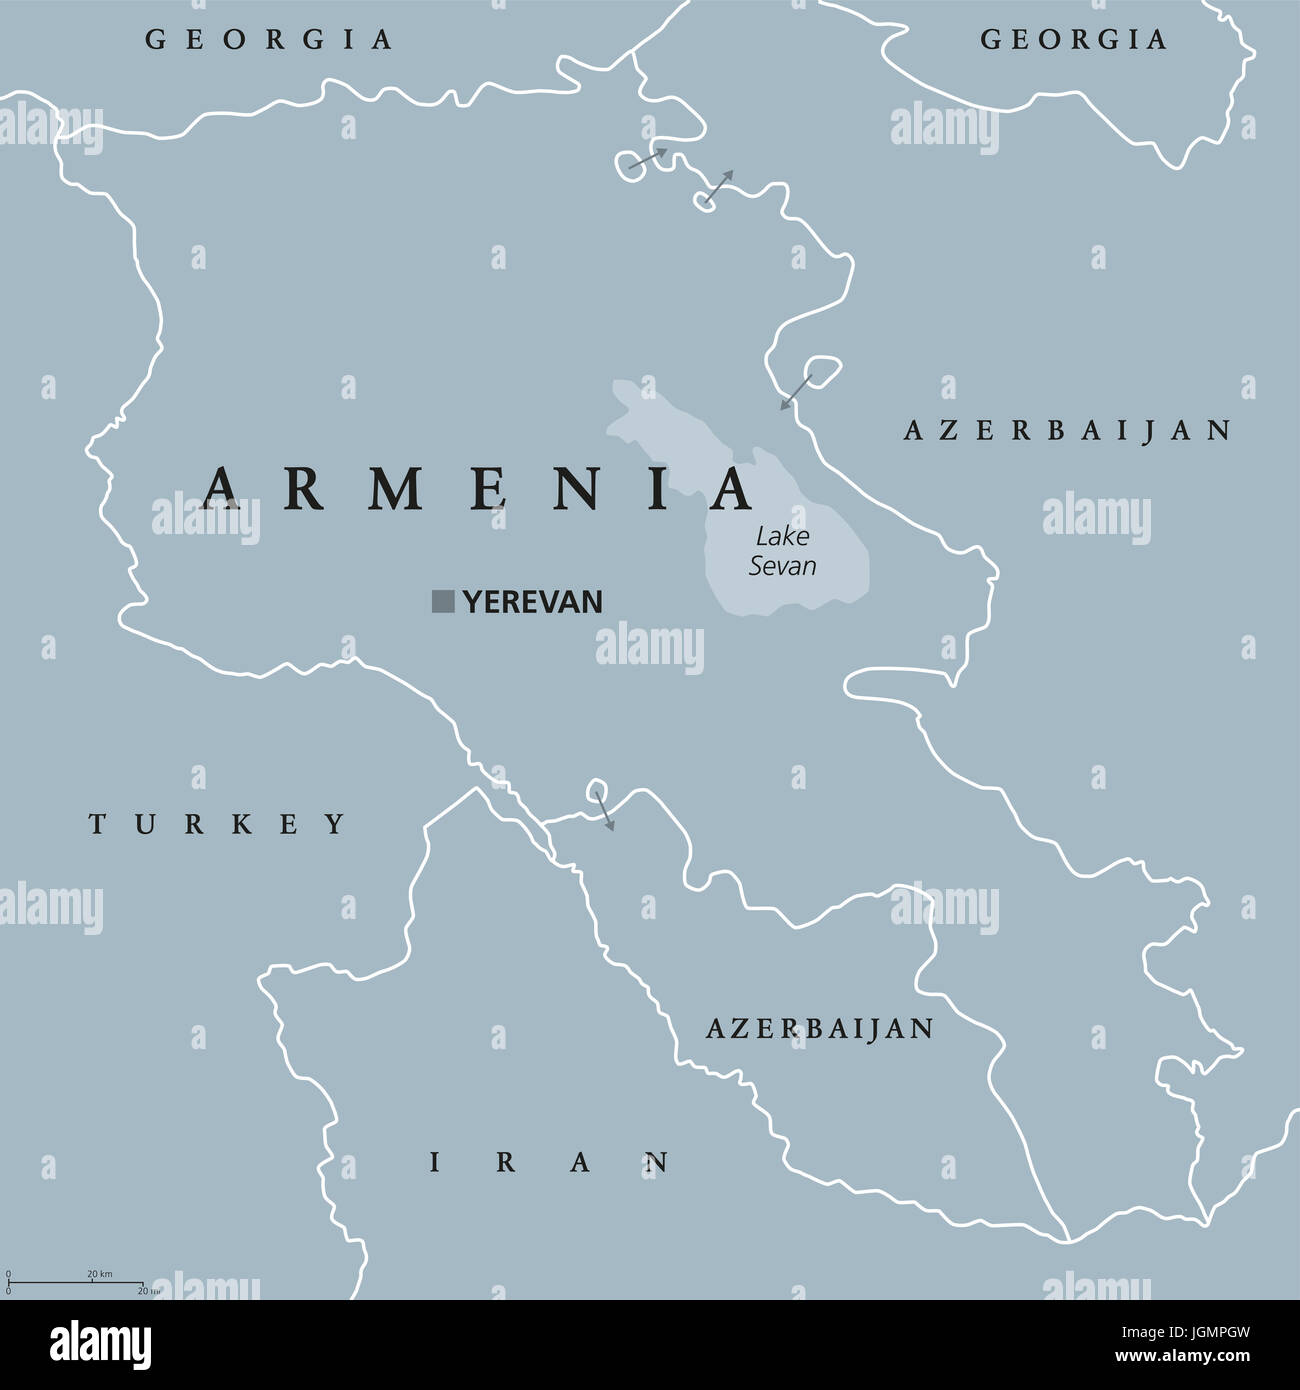 Armenia Political Map With Capital Yerevan Republic And Sovereign - Yerevan georgia map